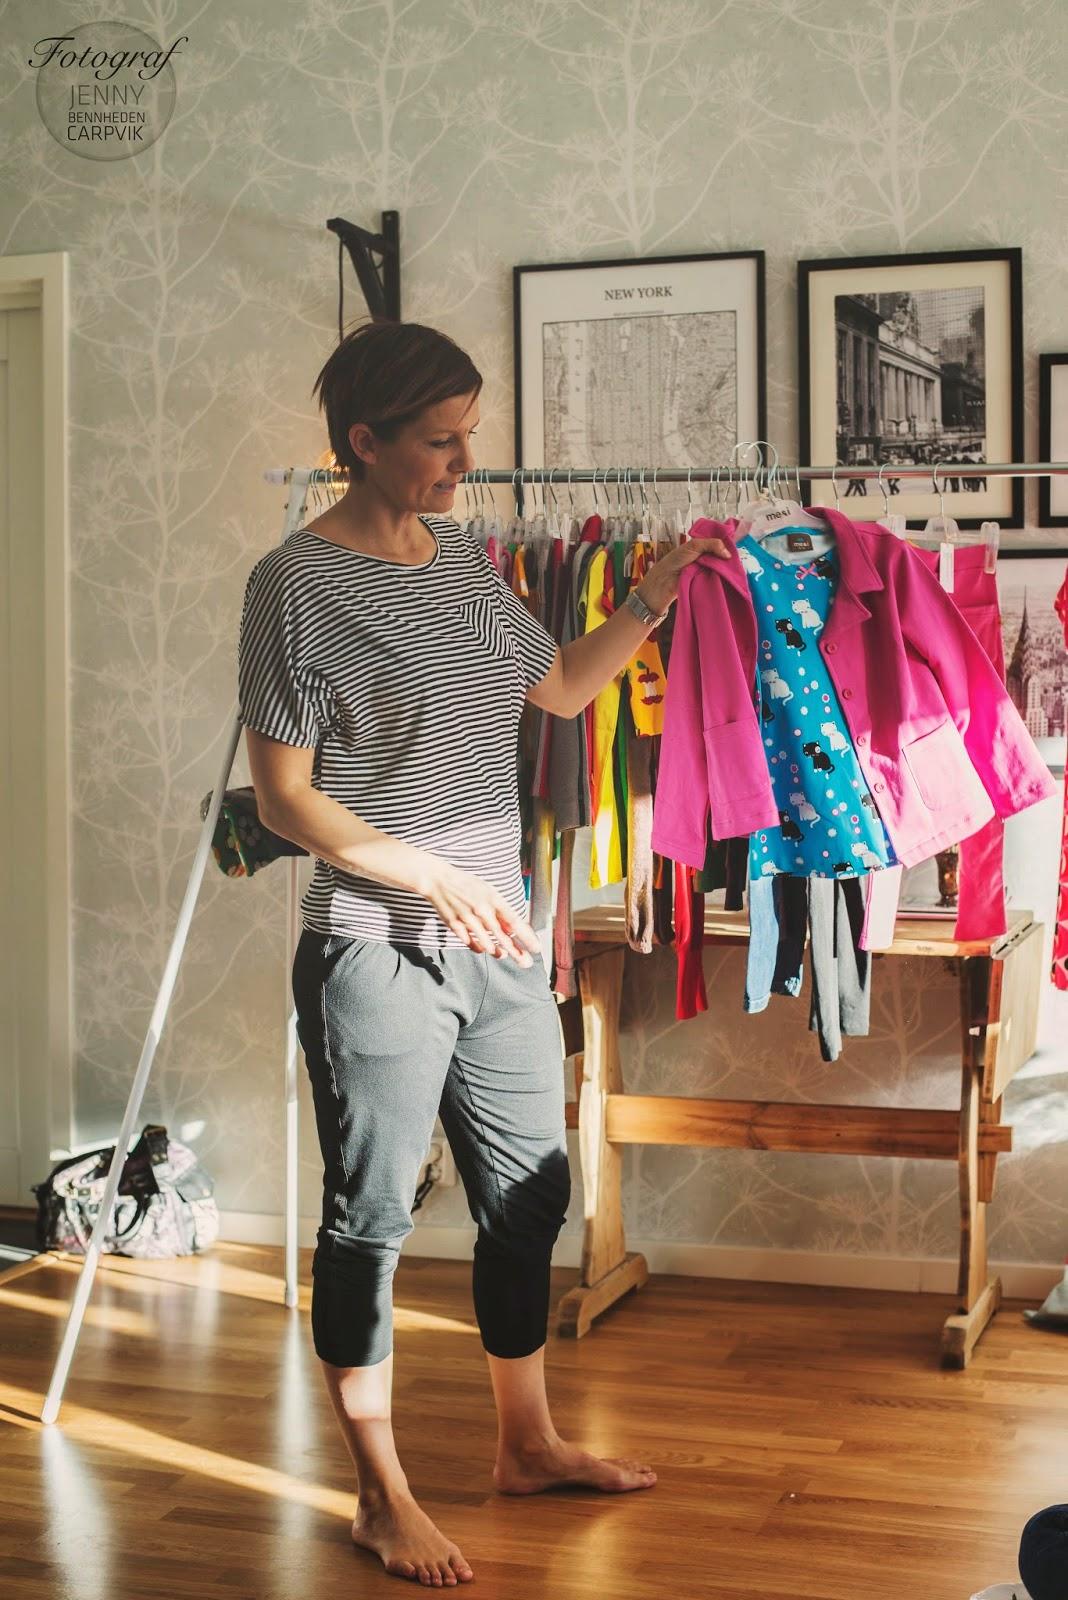 me&i, meandi, me&i-träff, kläder, homeshopping, shopping, kläder, oeko-tex, öko-tex, modal, bomull